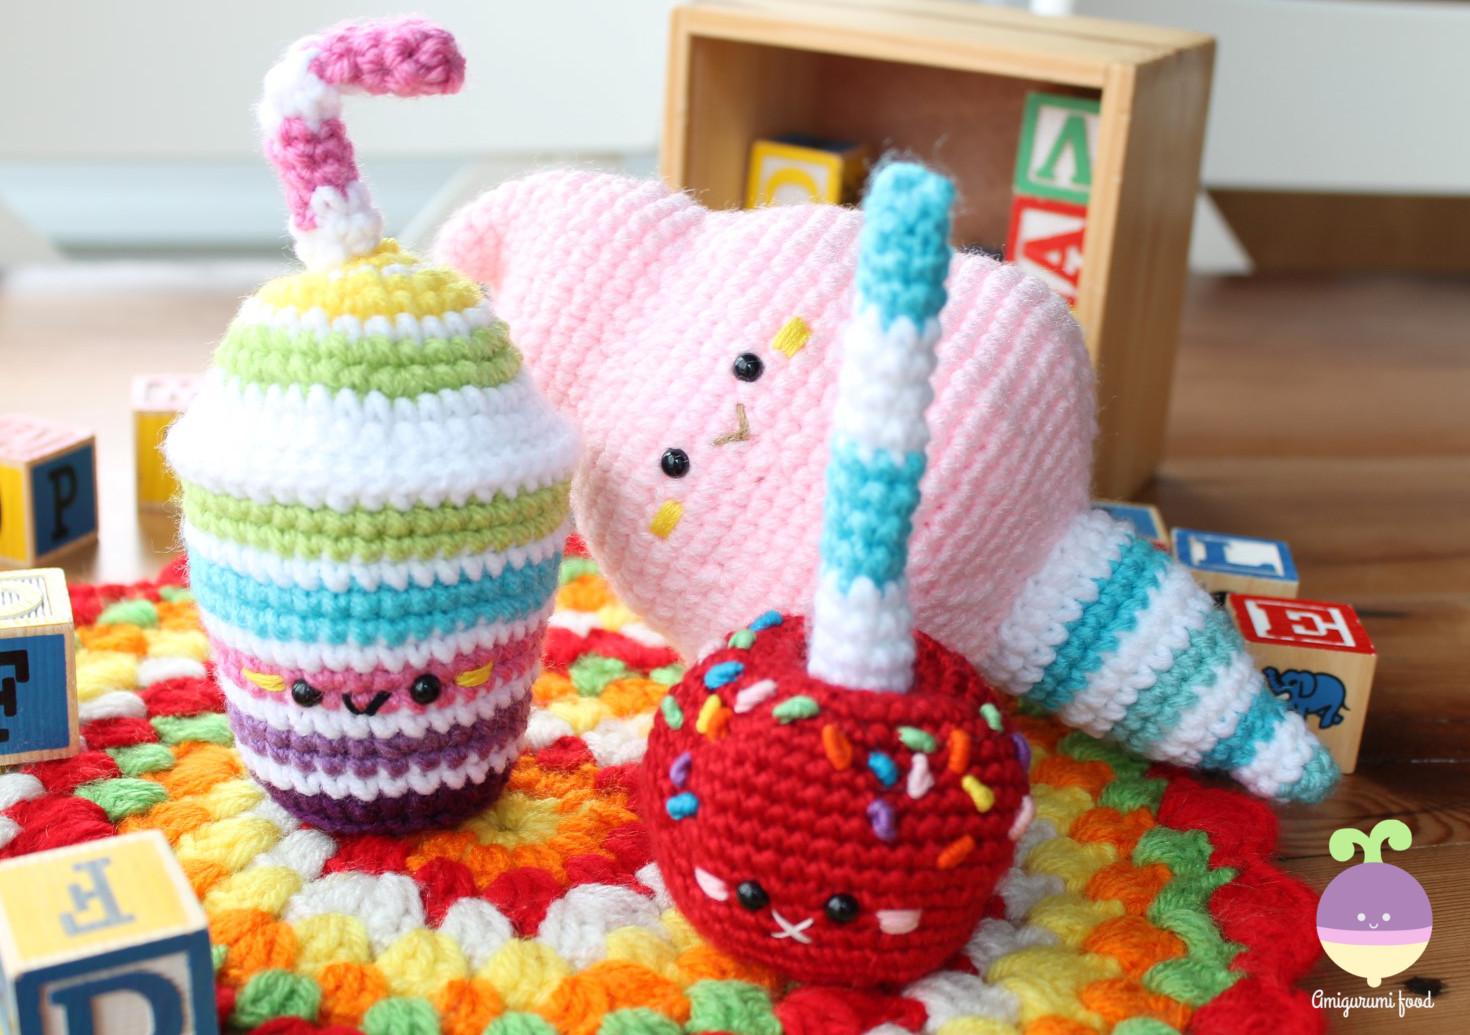 Amigurumi food amigurumi food on etsy carnival party amigurumi food crochet pattern bankloansurffo Choice Image